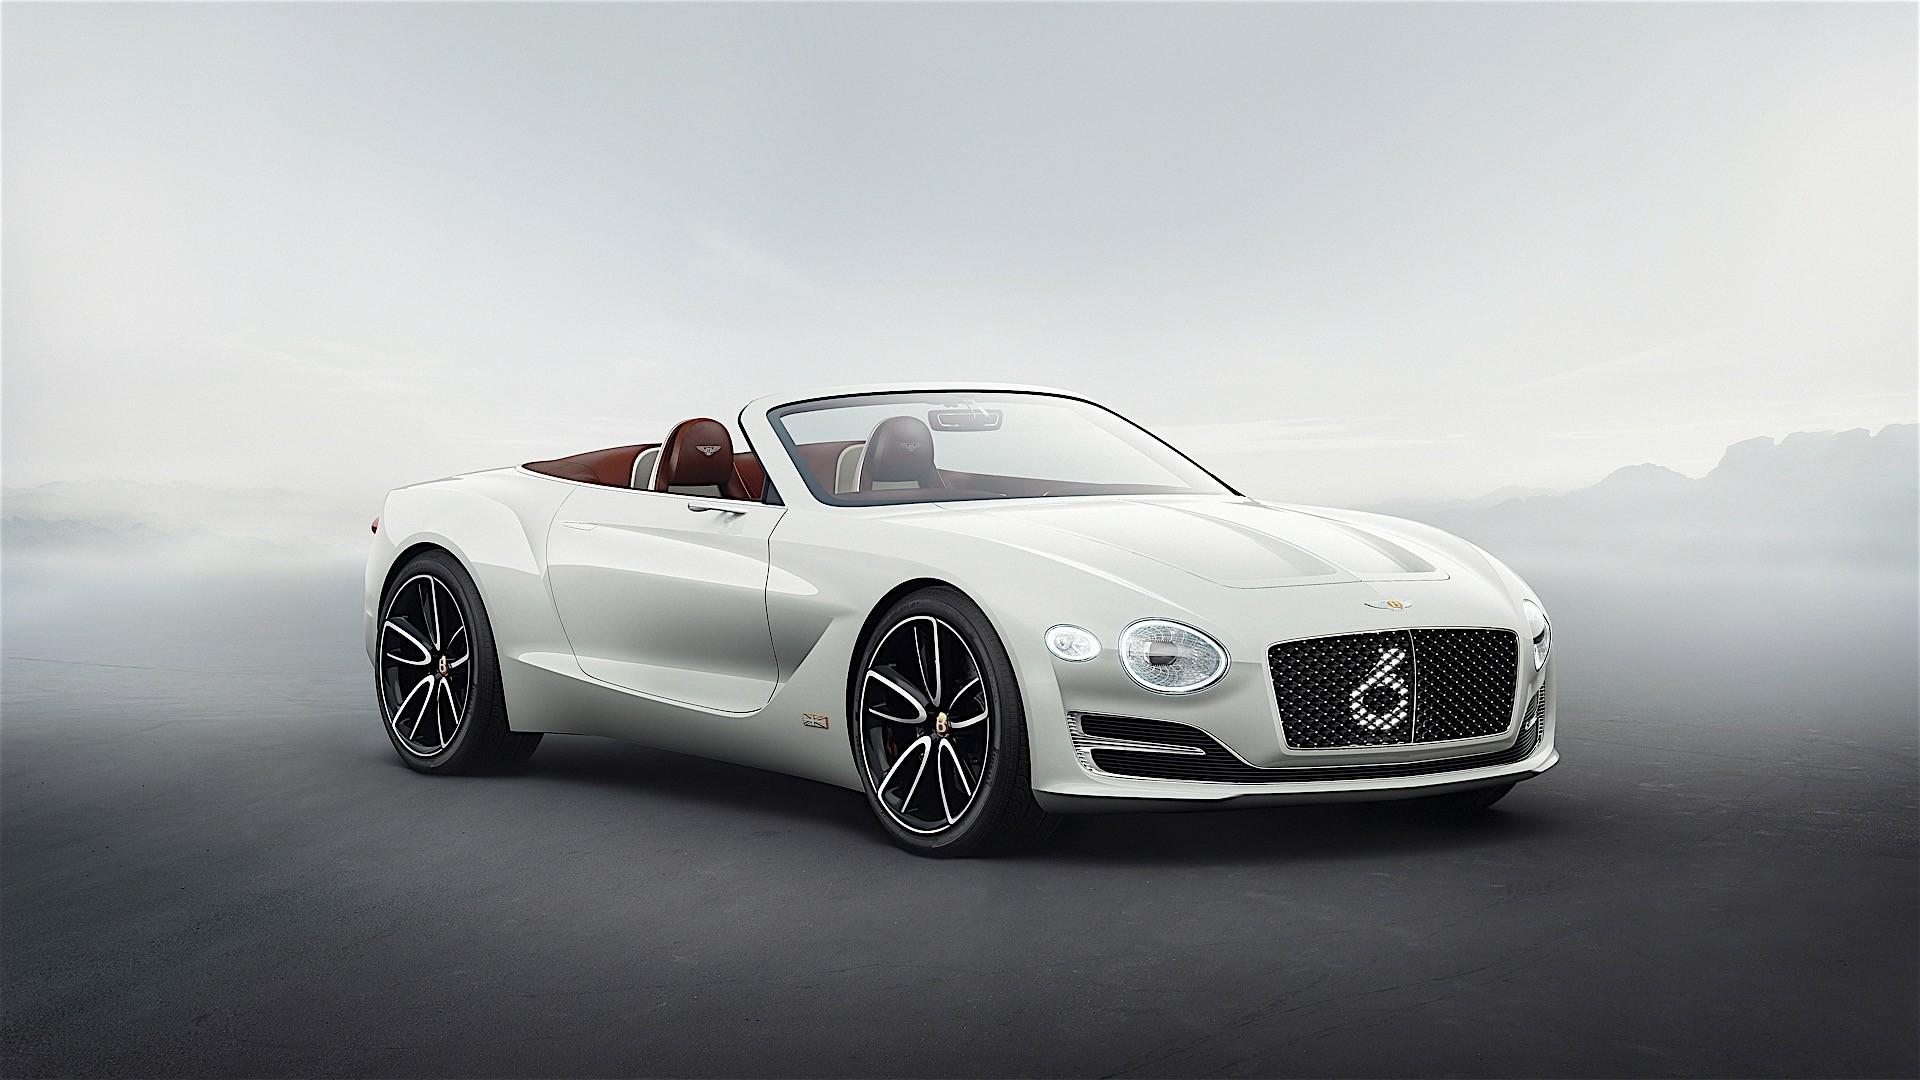 Bentley-gui-thong-diep-moi-voi-xe-dien-anh-1